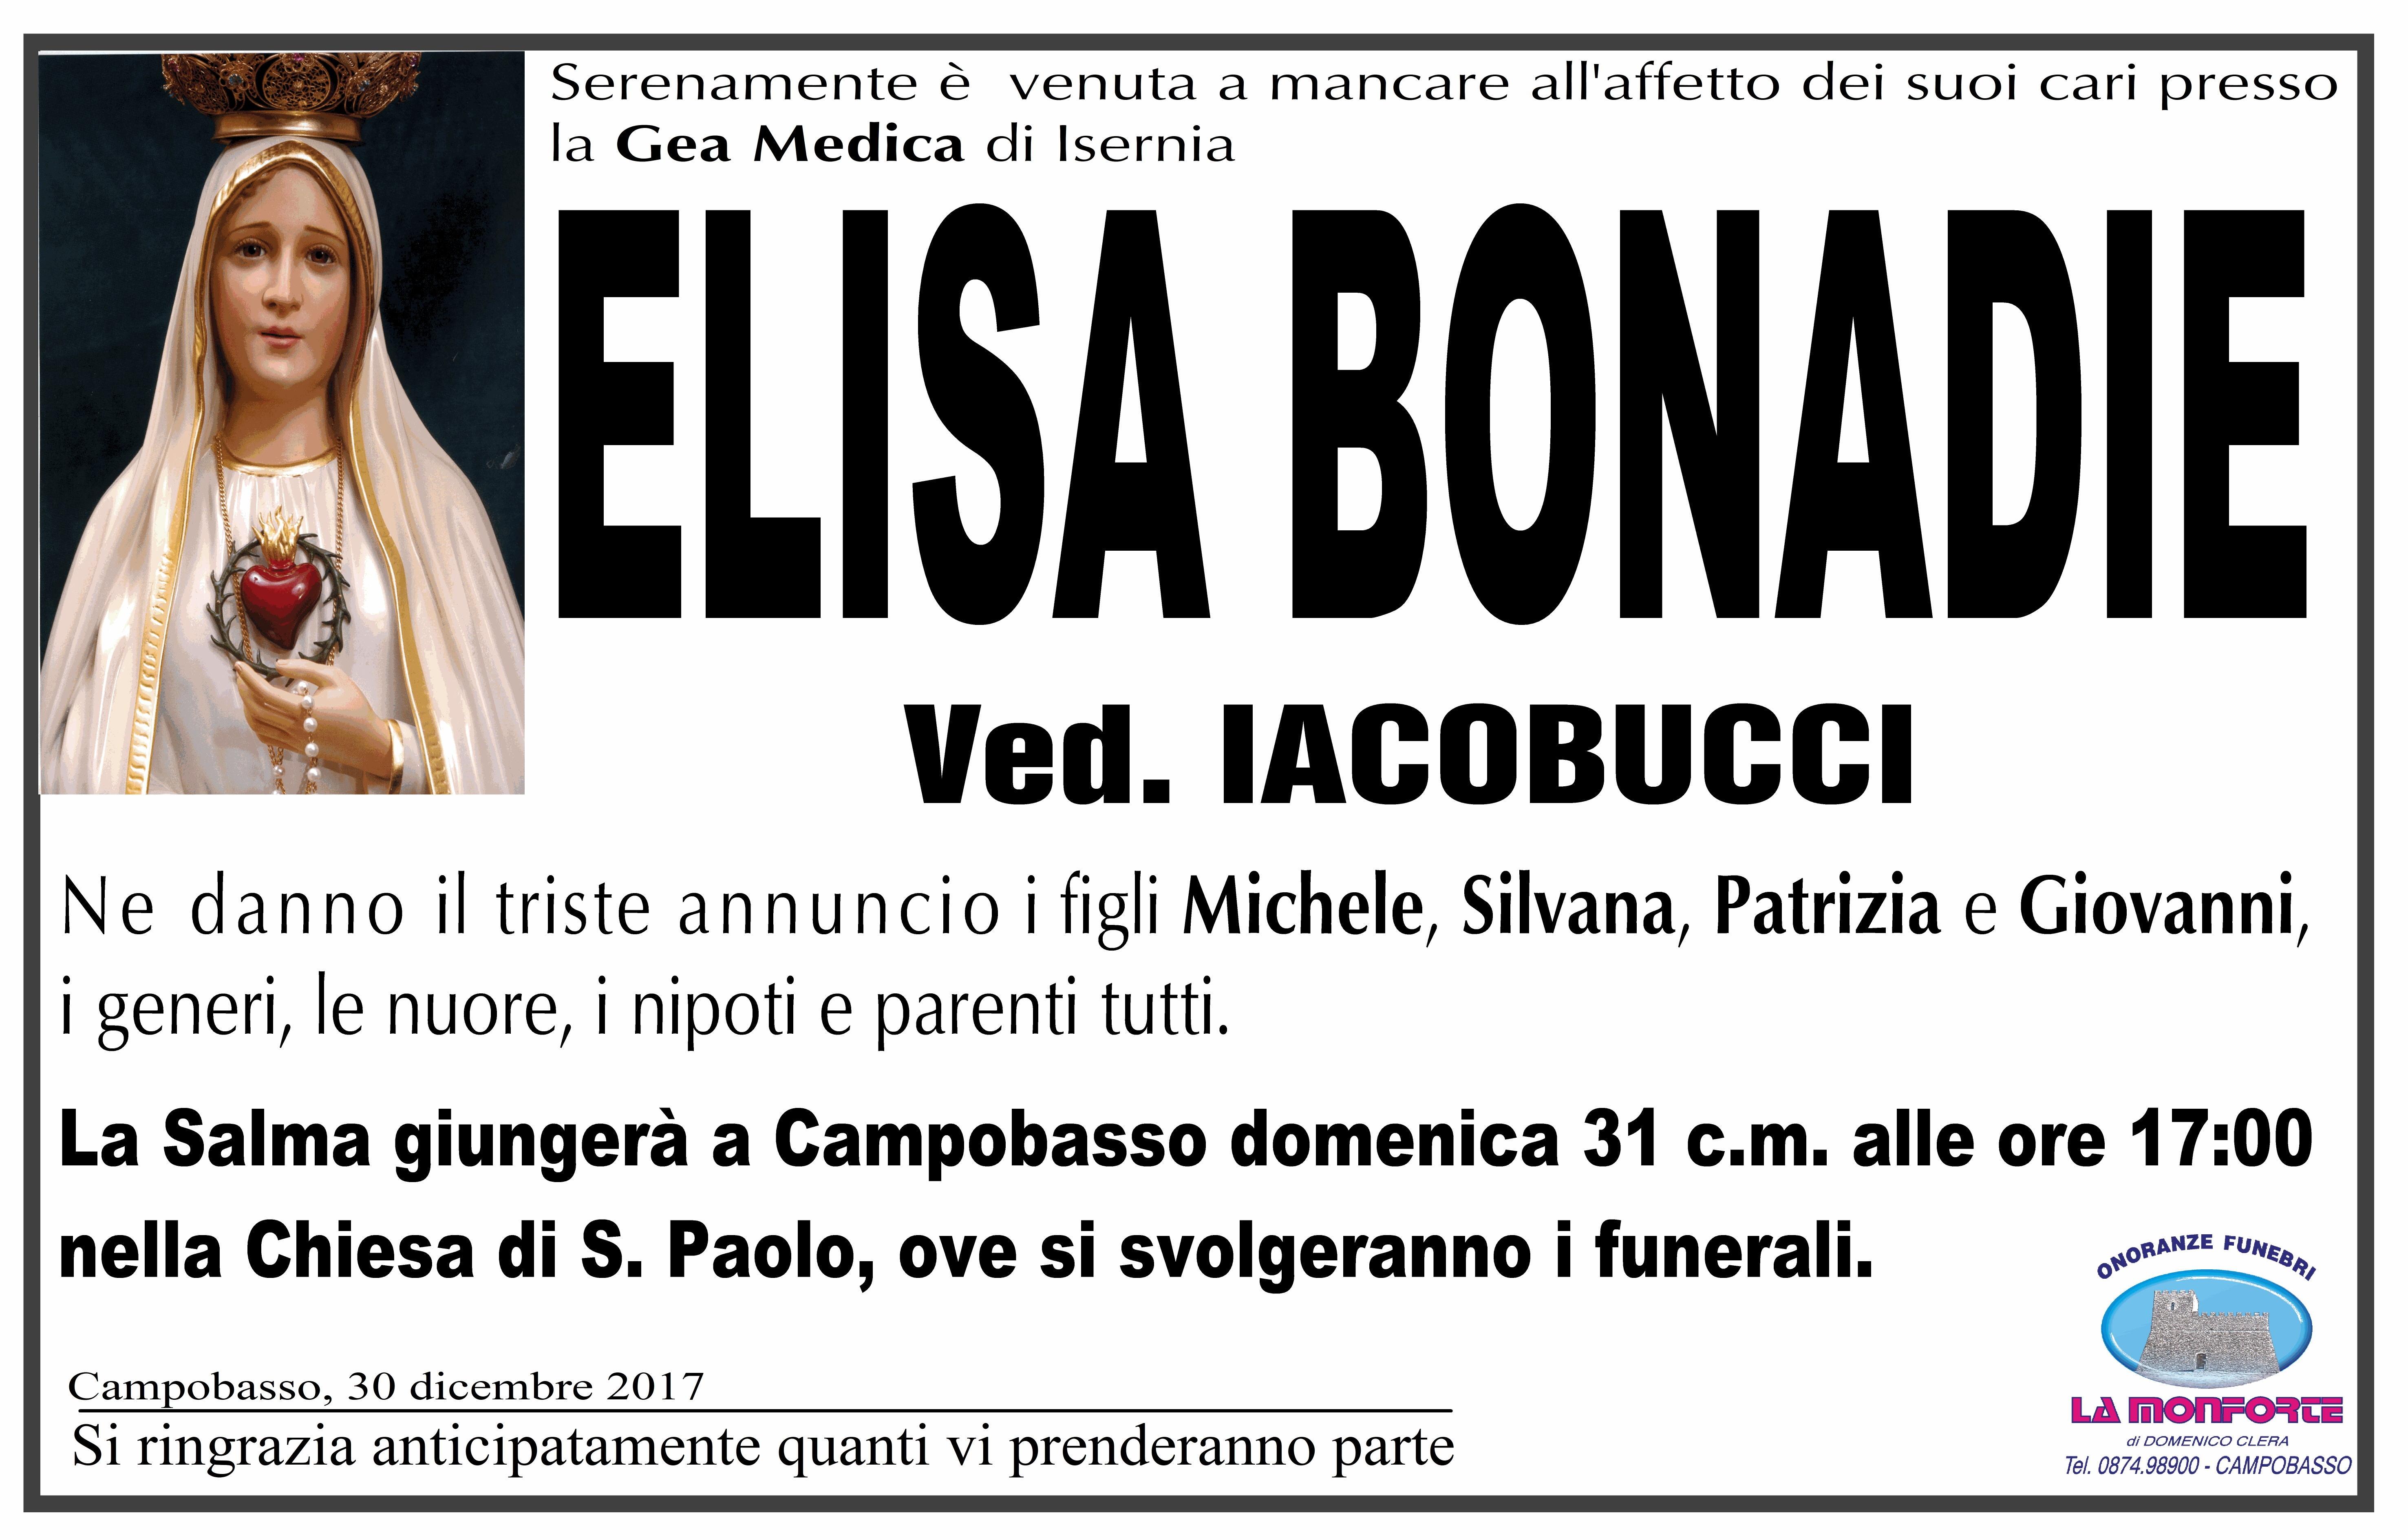 Elisa Bonadie, 30/12/2017, Campobasso – Onoranze Funebri La Monforte